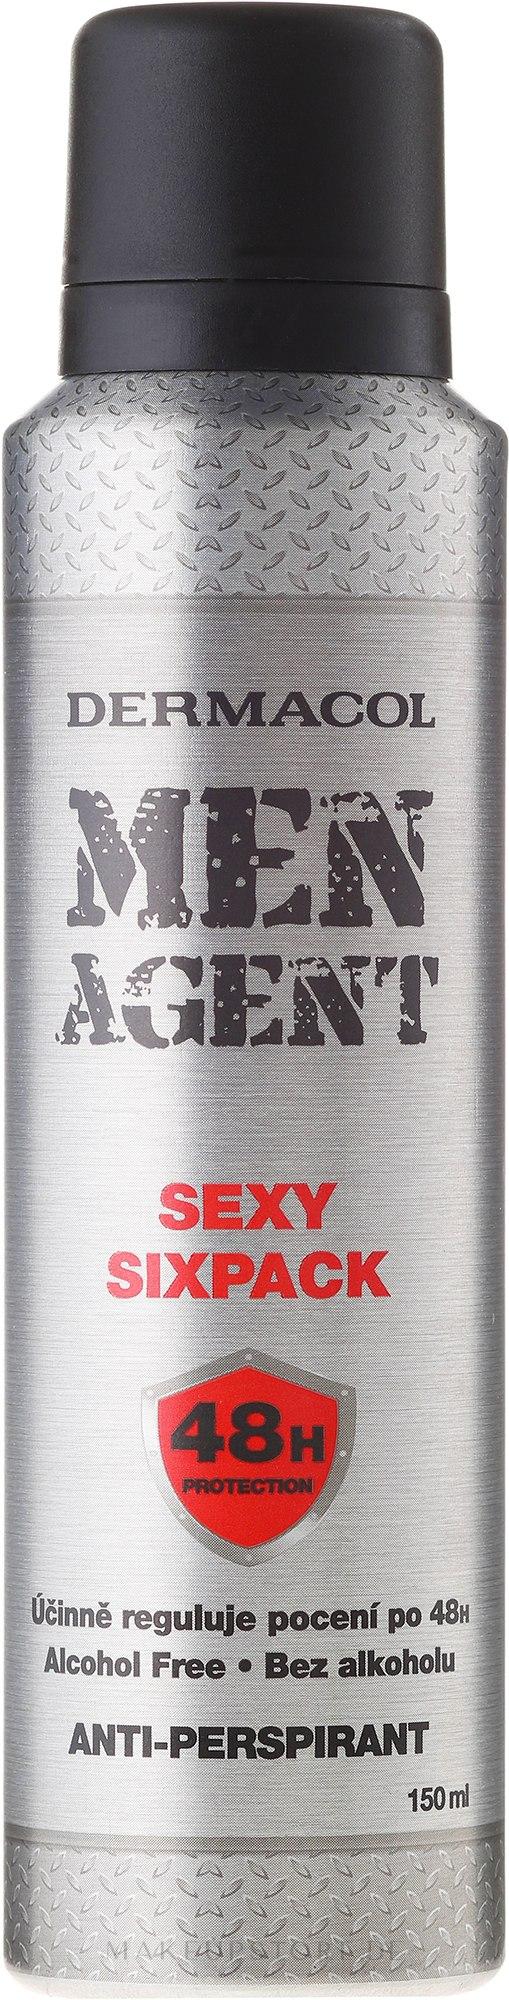 "Deospray Antitranspirant ""Sexy Sixpack"" - Dermacol Men Agent Sexy Sixpack 48H Protection Anti-Perspirant — Bild 150 ml"